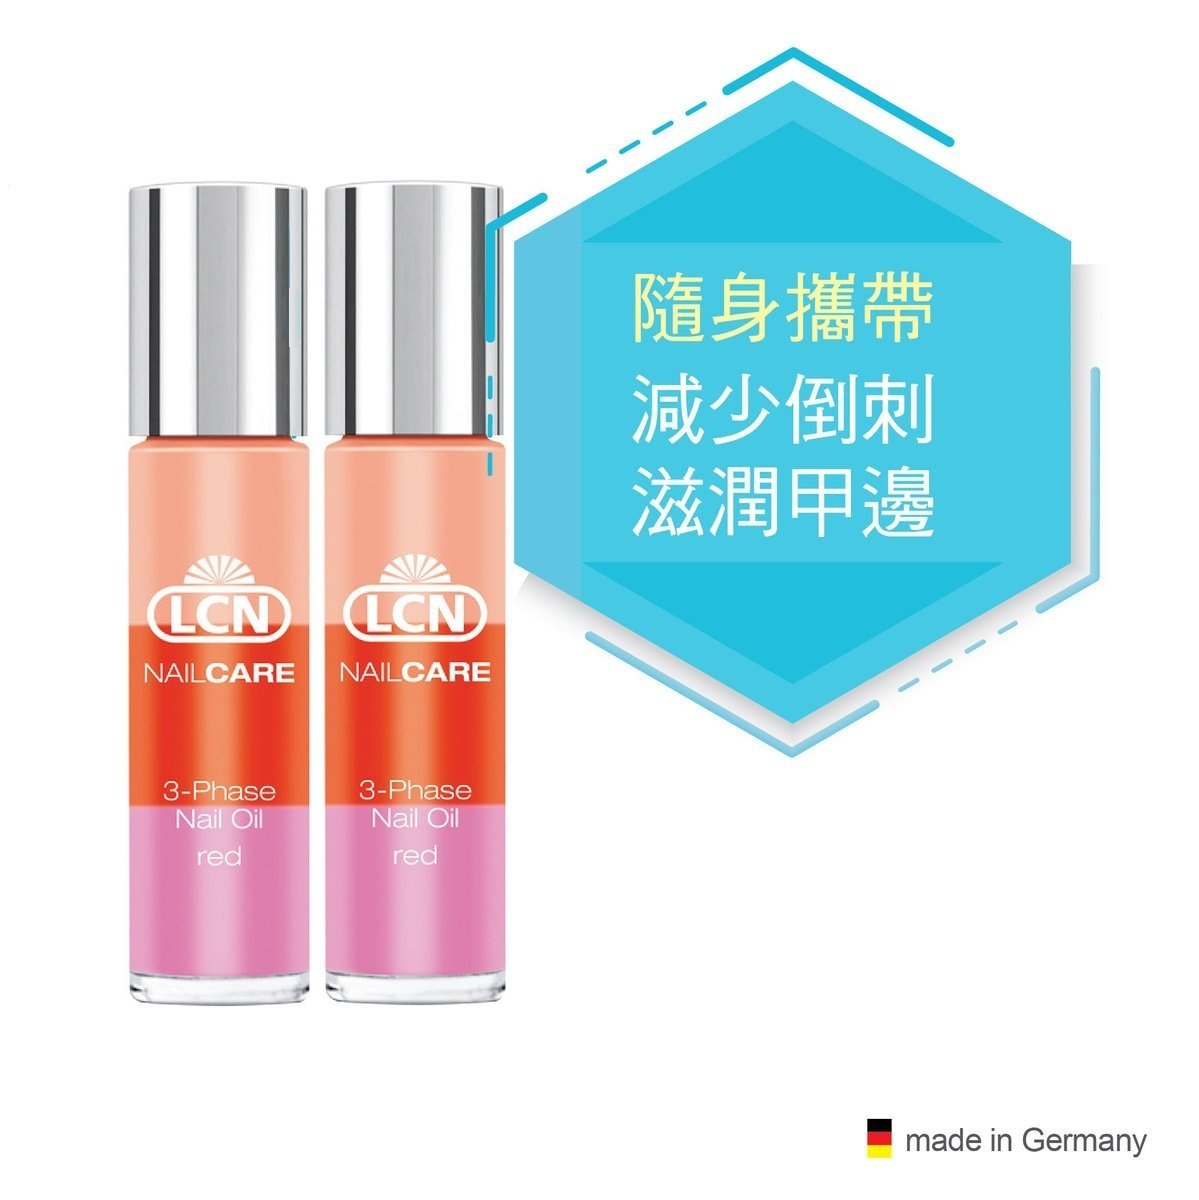 3-Phase oil 10ml (2 pcs)